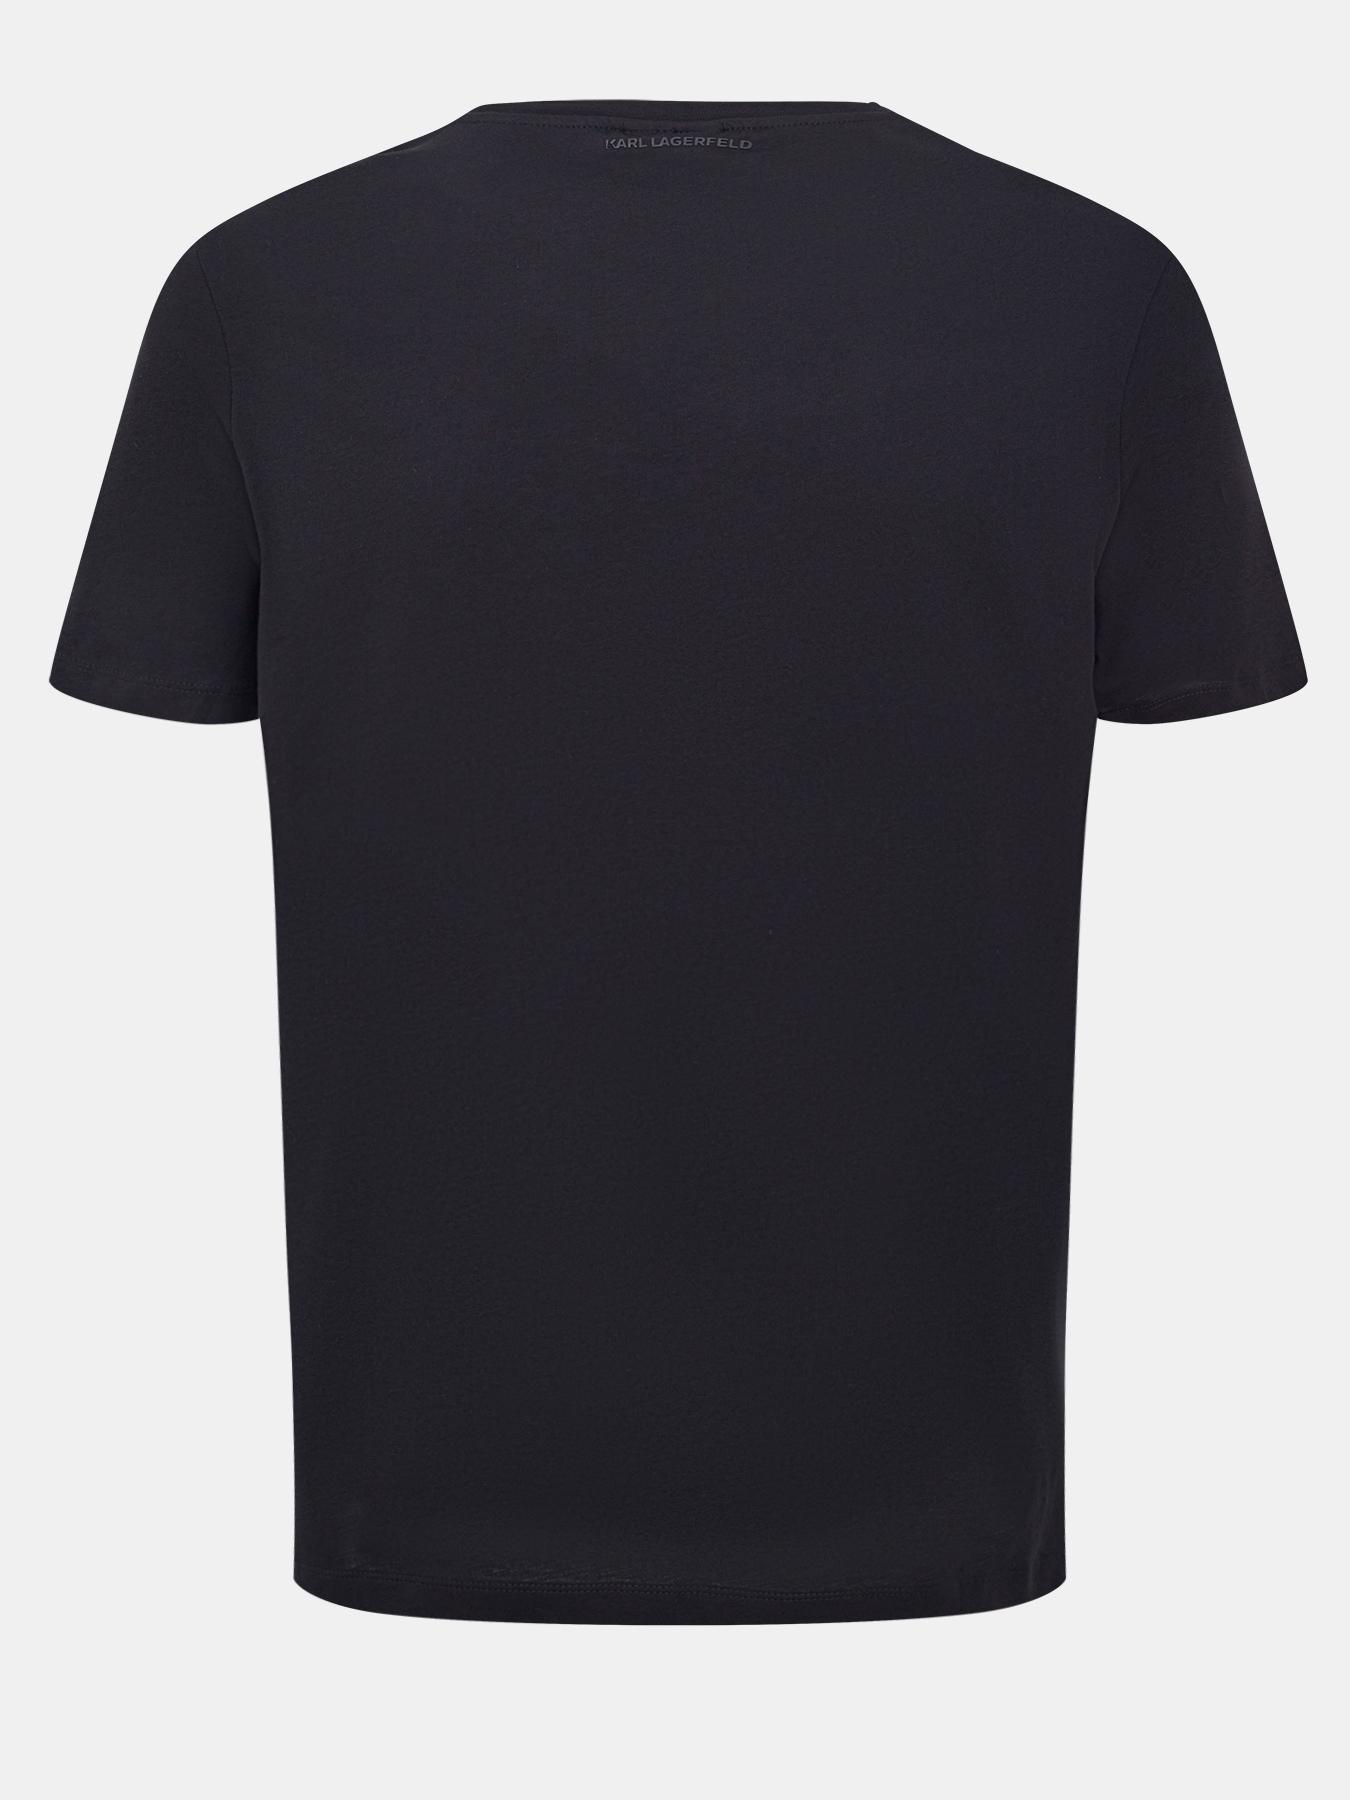 Фуфайка (футболка) Karl Lagerfeld Футболка karl lagerfeld vintage браслет из жемчуга